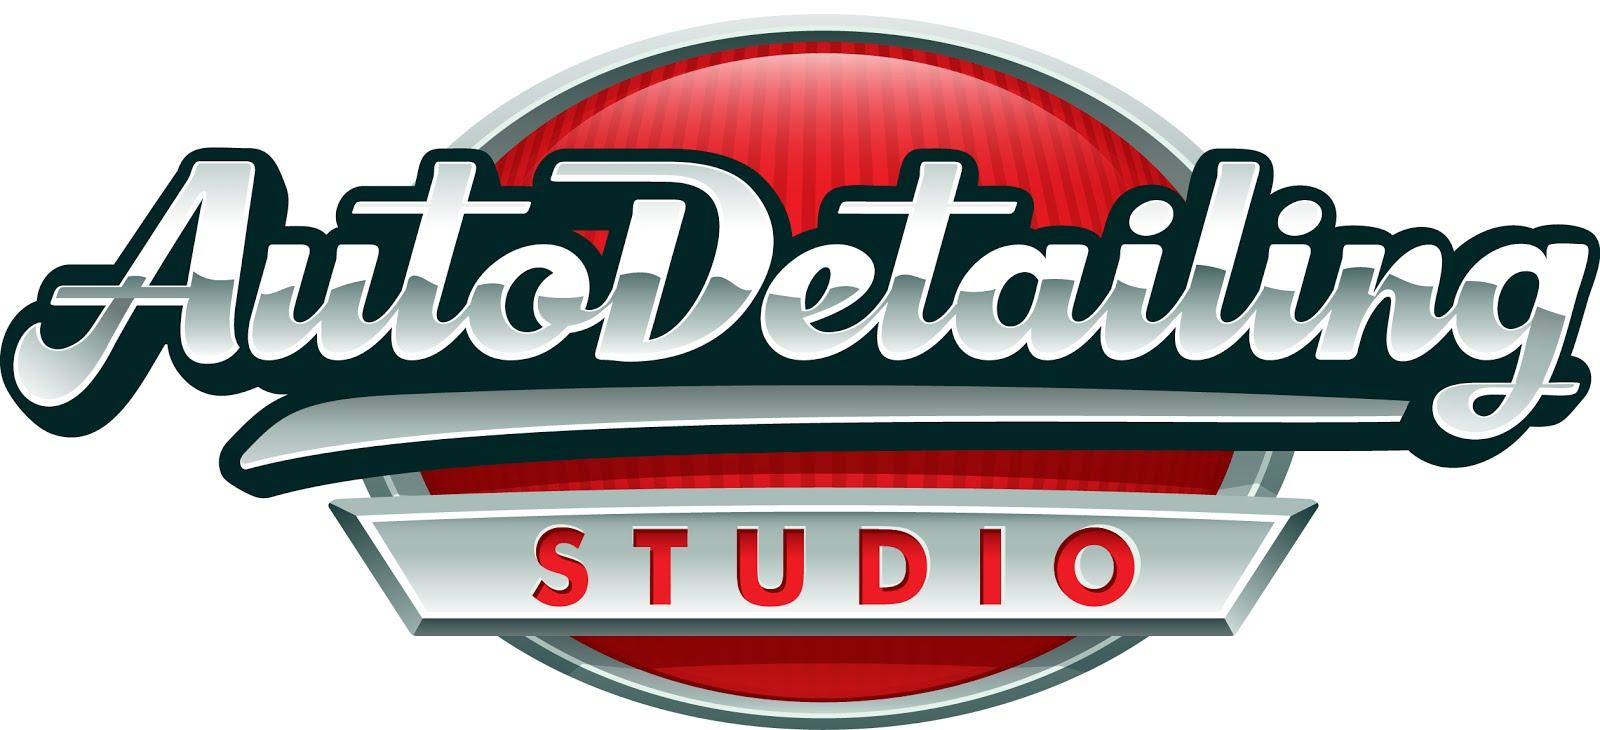 Car Detailing Clipart Free Download Best Car Detailing